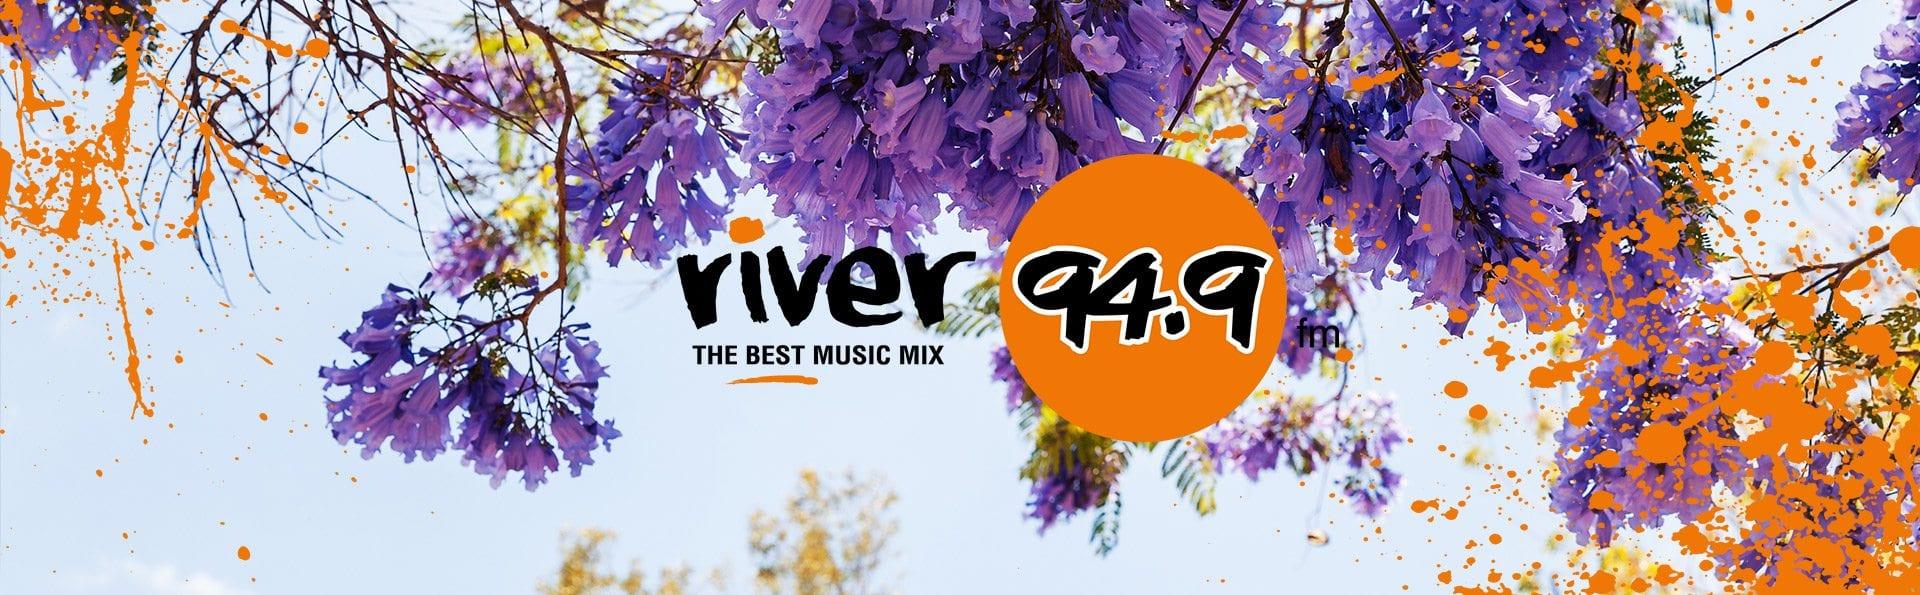 River949-slide